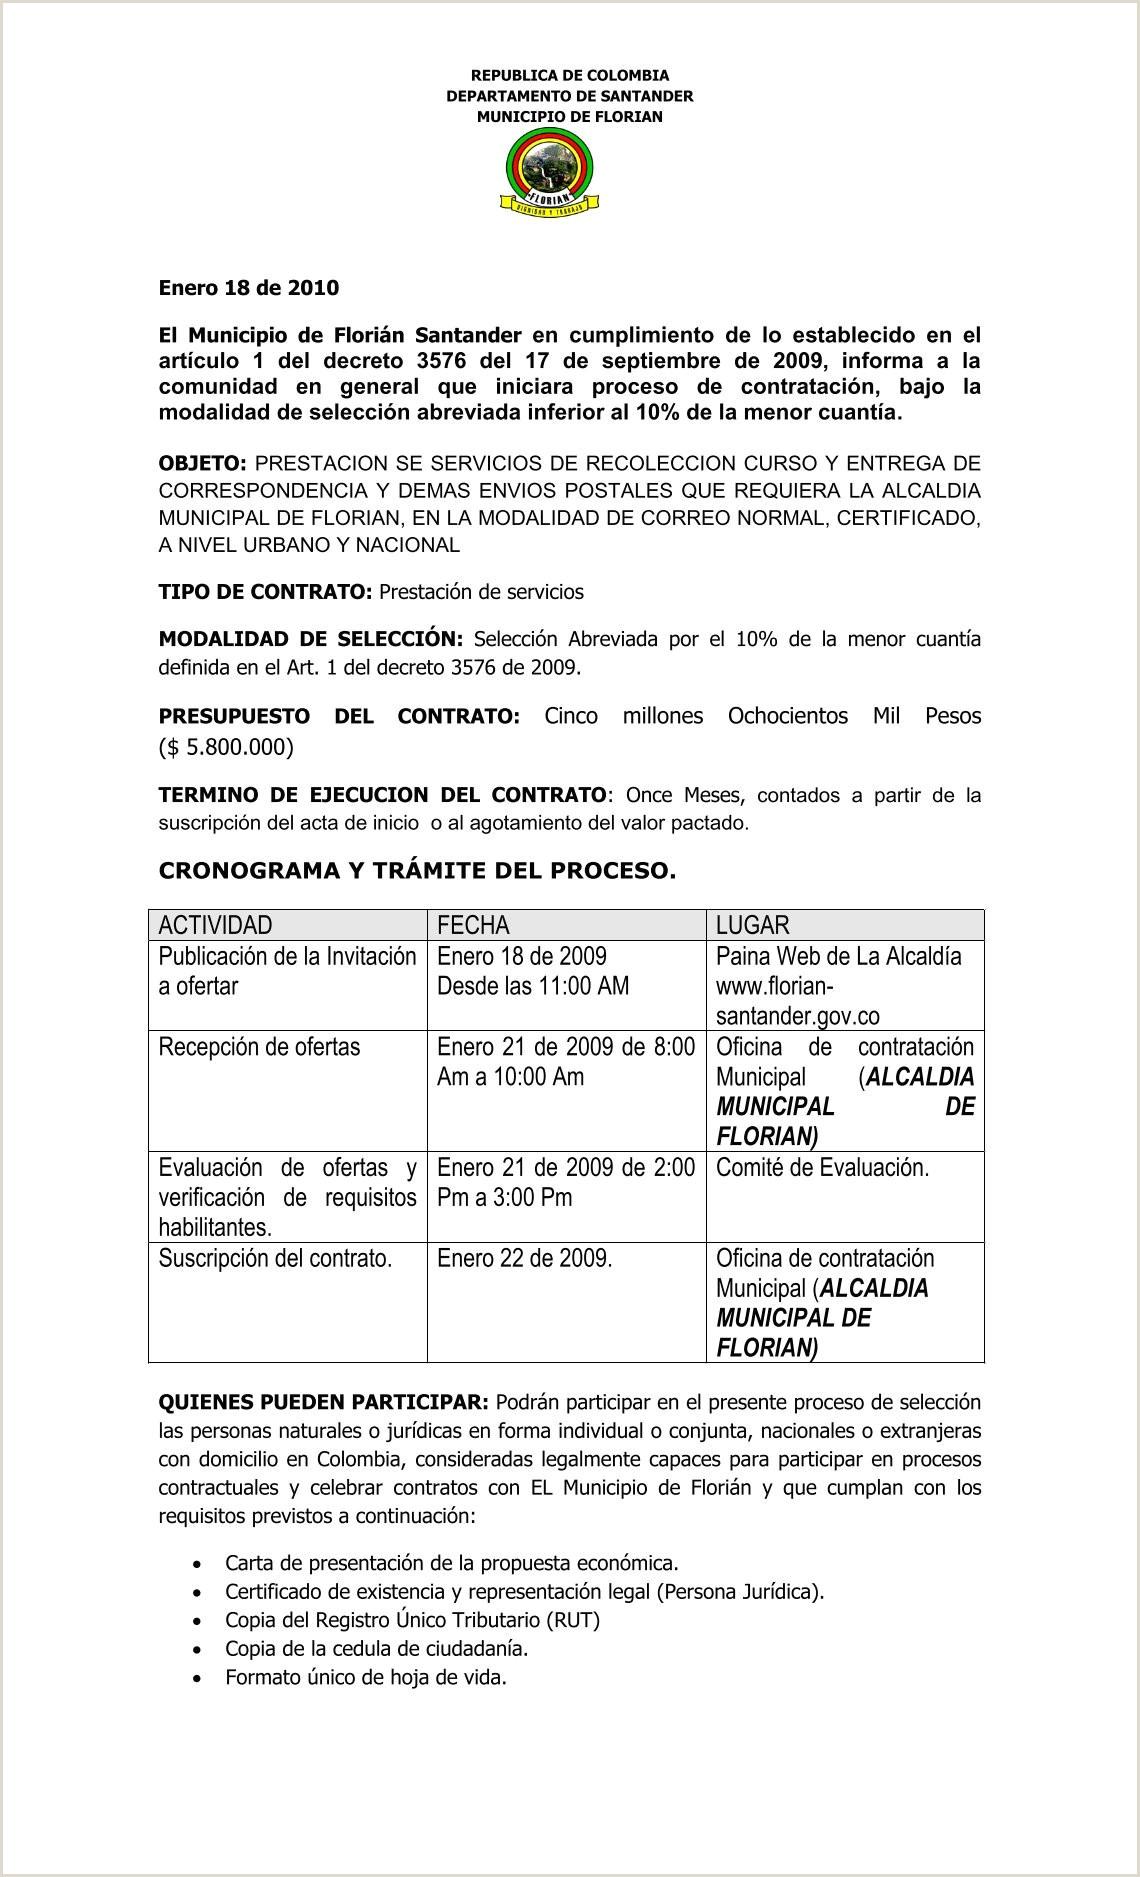 Hoja De Vida Formato Unico Persona Juridica 20 Free Magazines From Florian Santander Gov Co